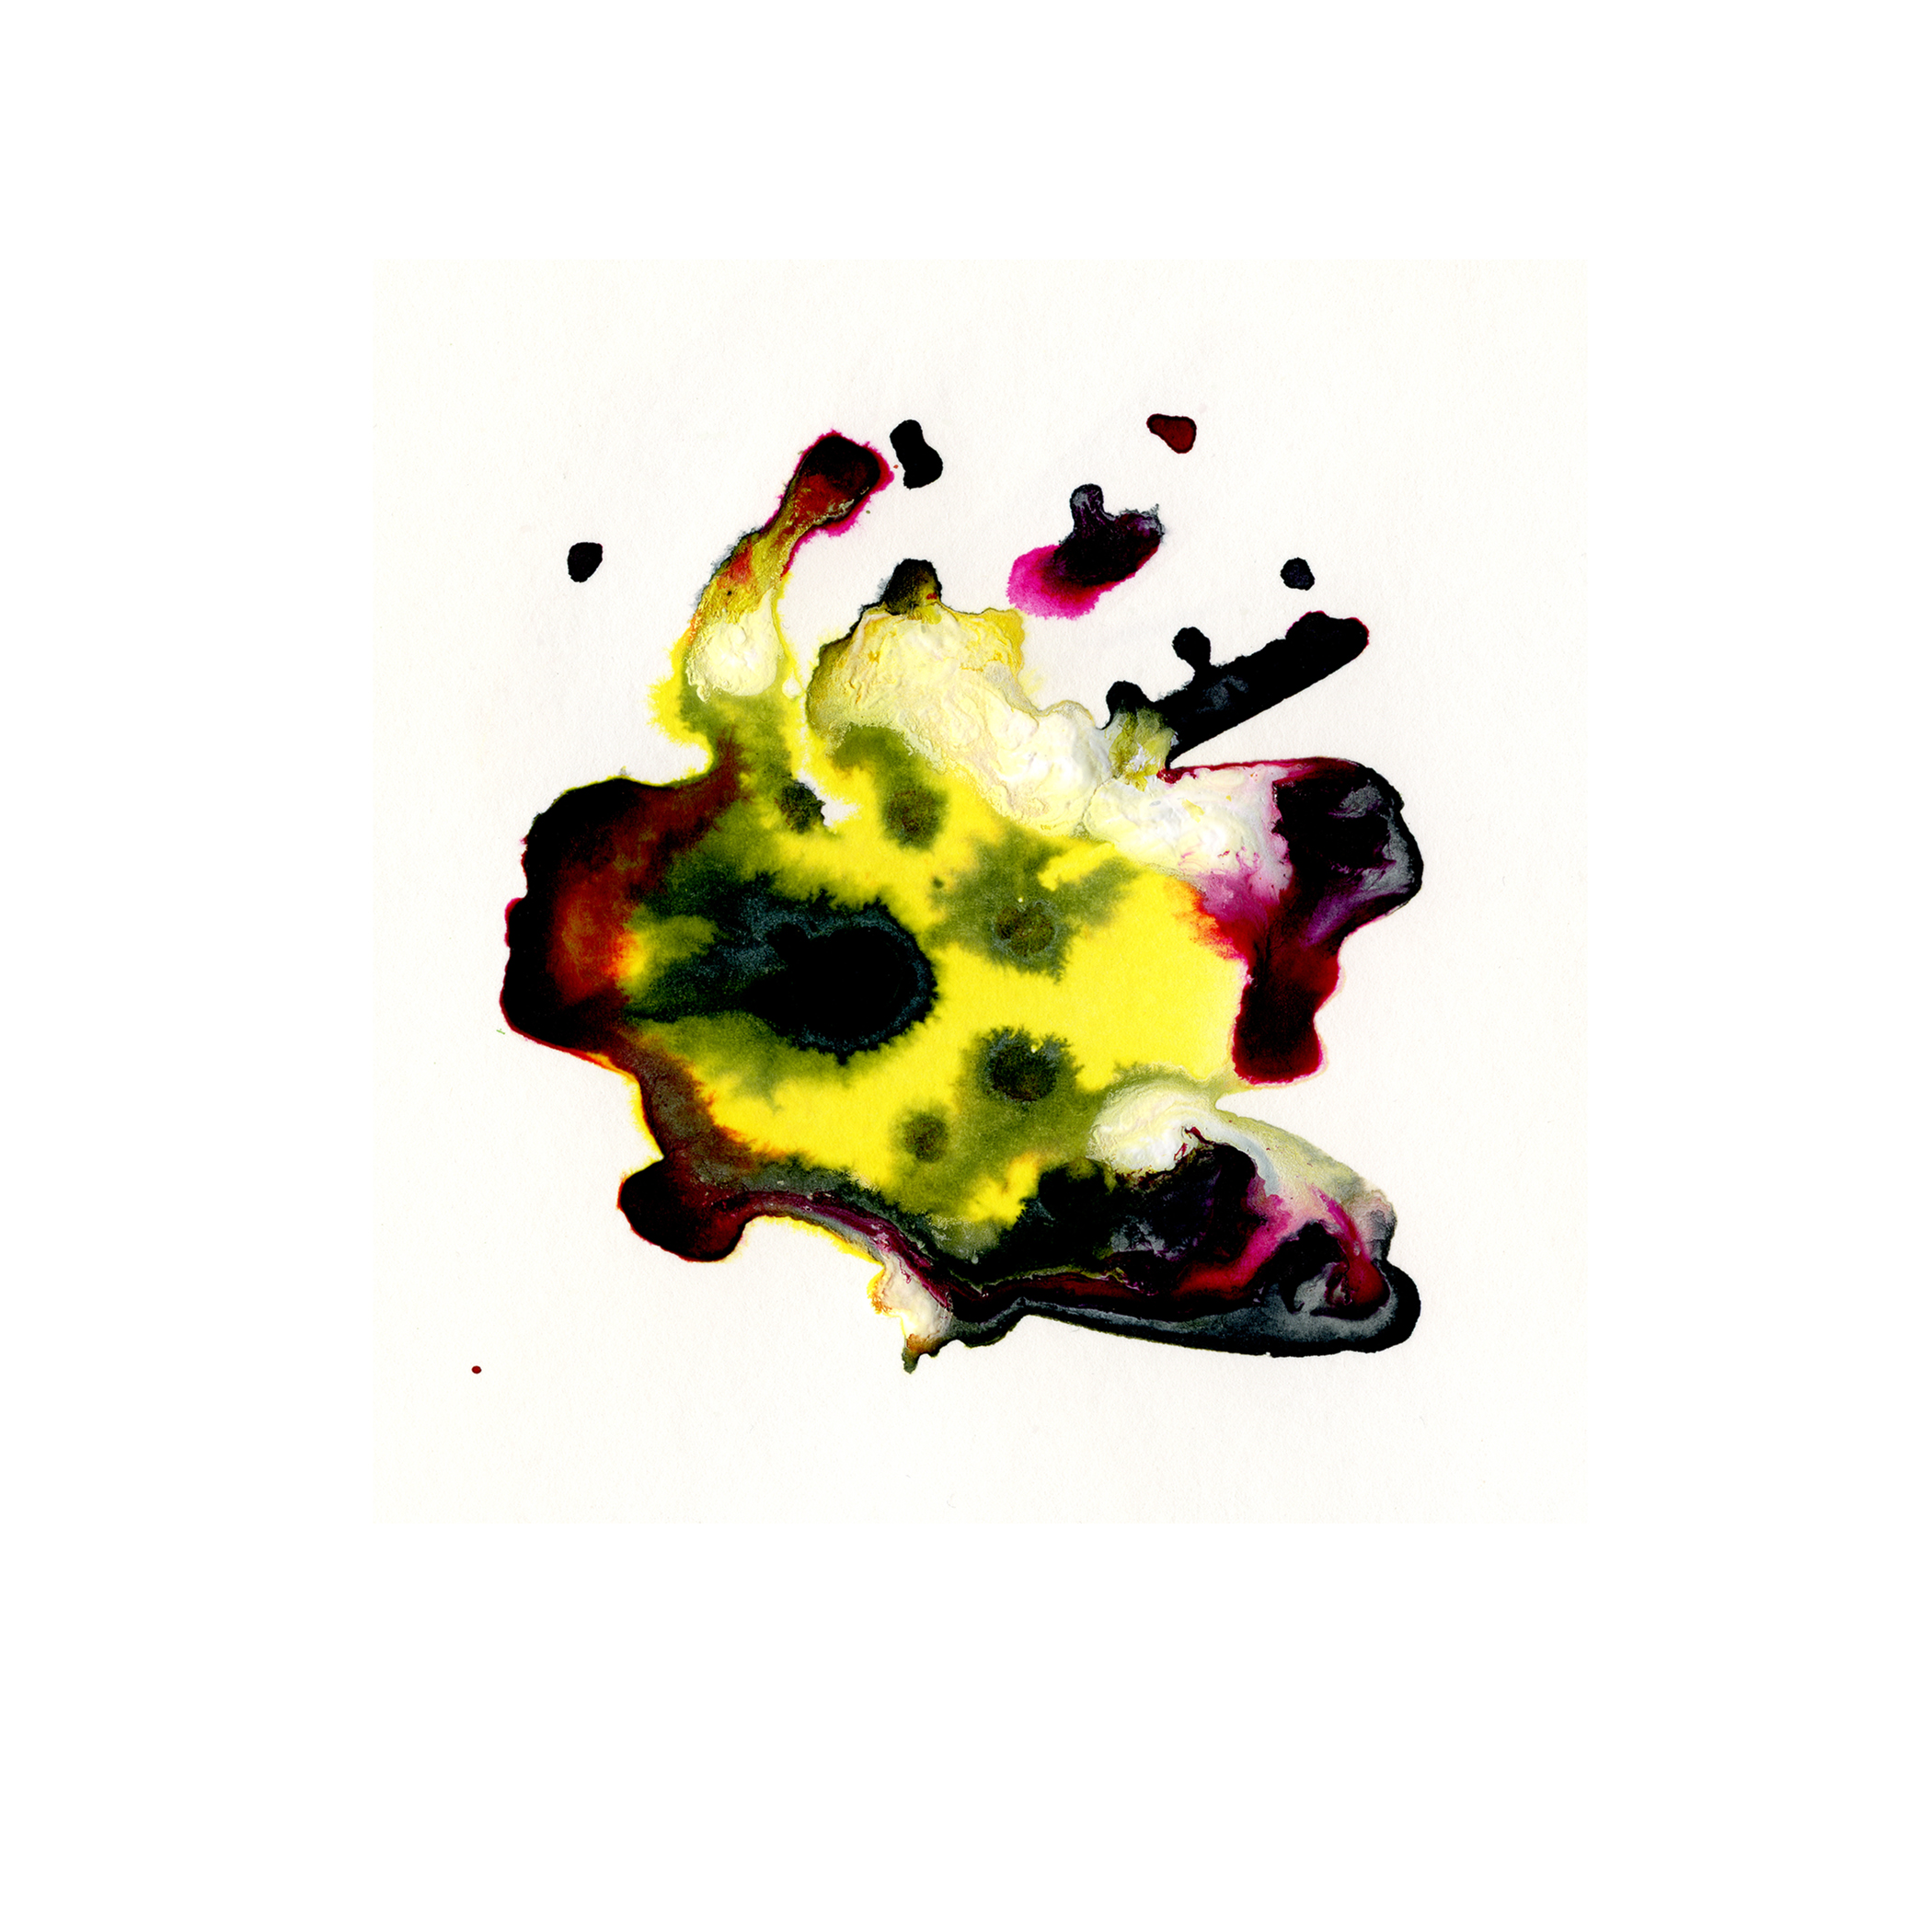 79.Daffodil.4.28.14.jpg